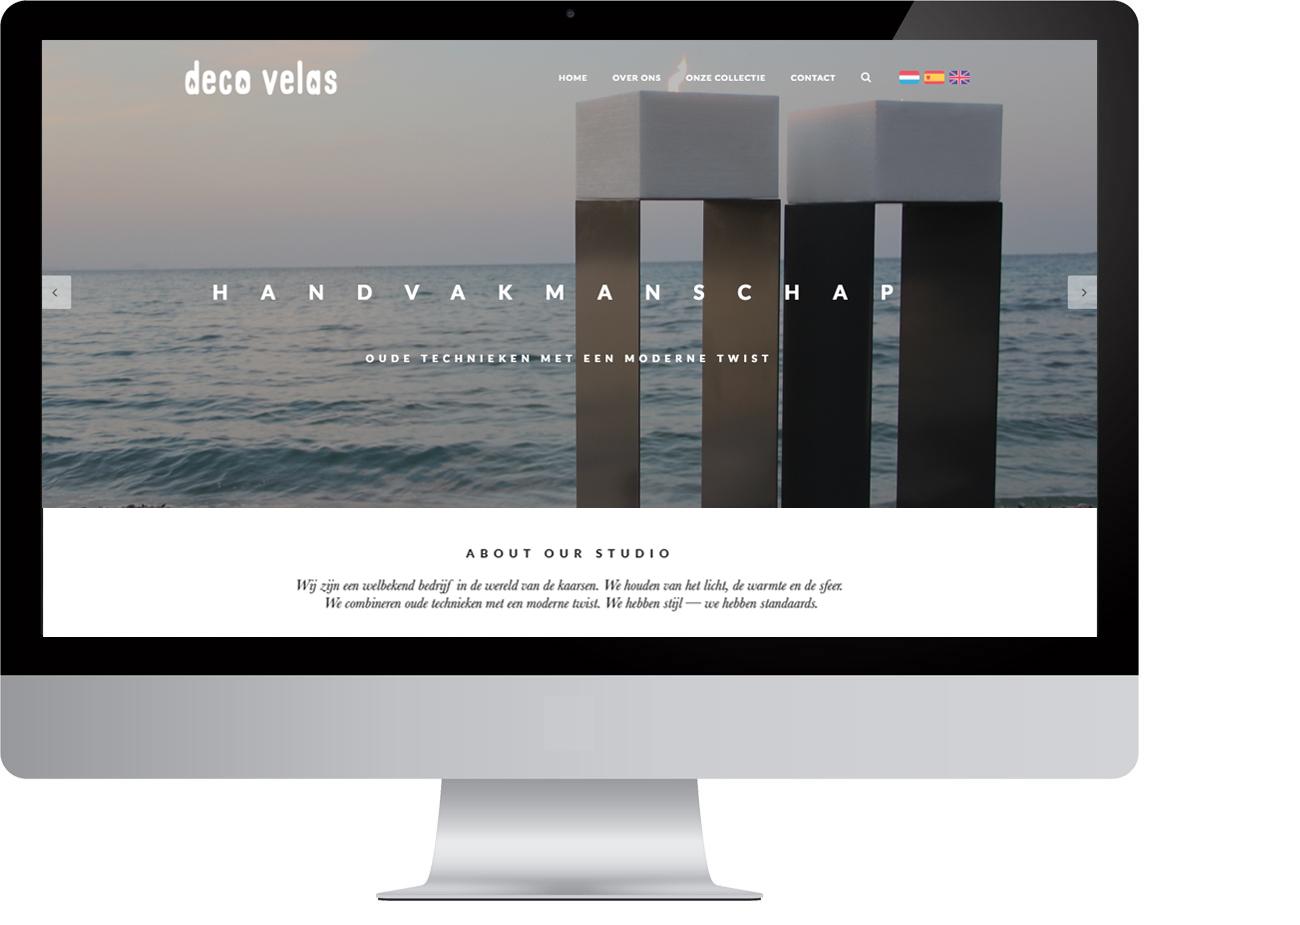 Deco velas branding webshop by bottle post media